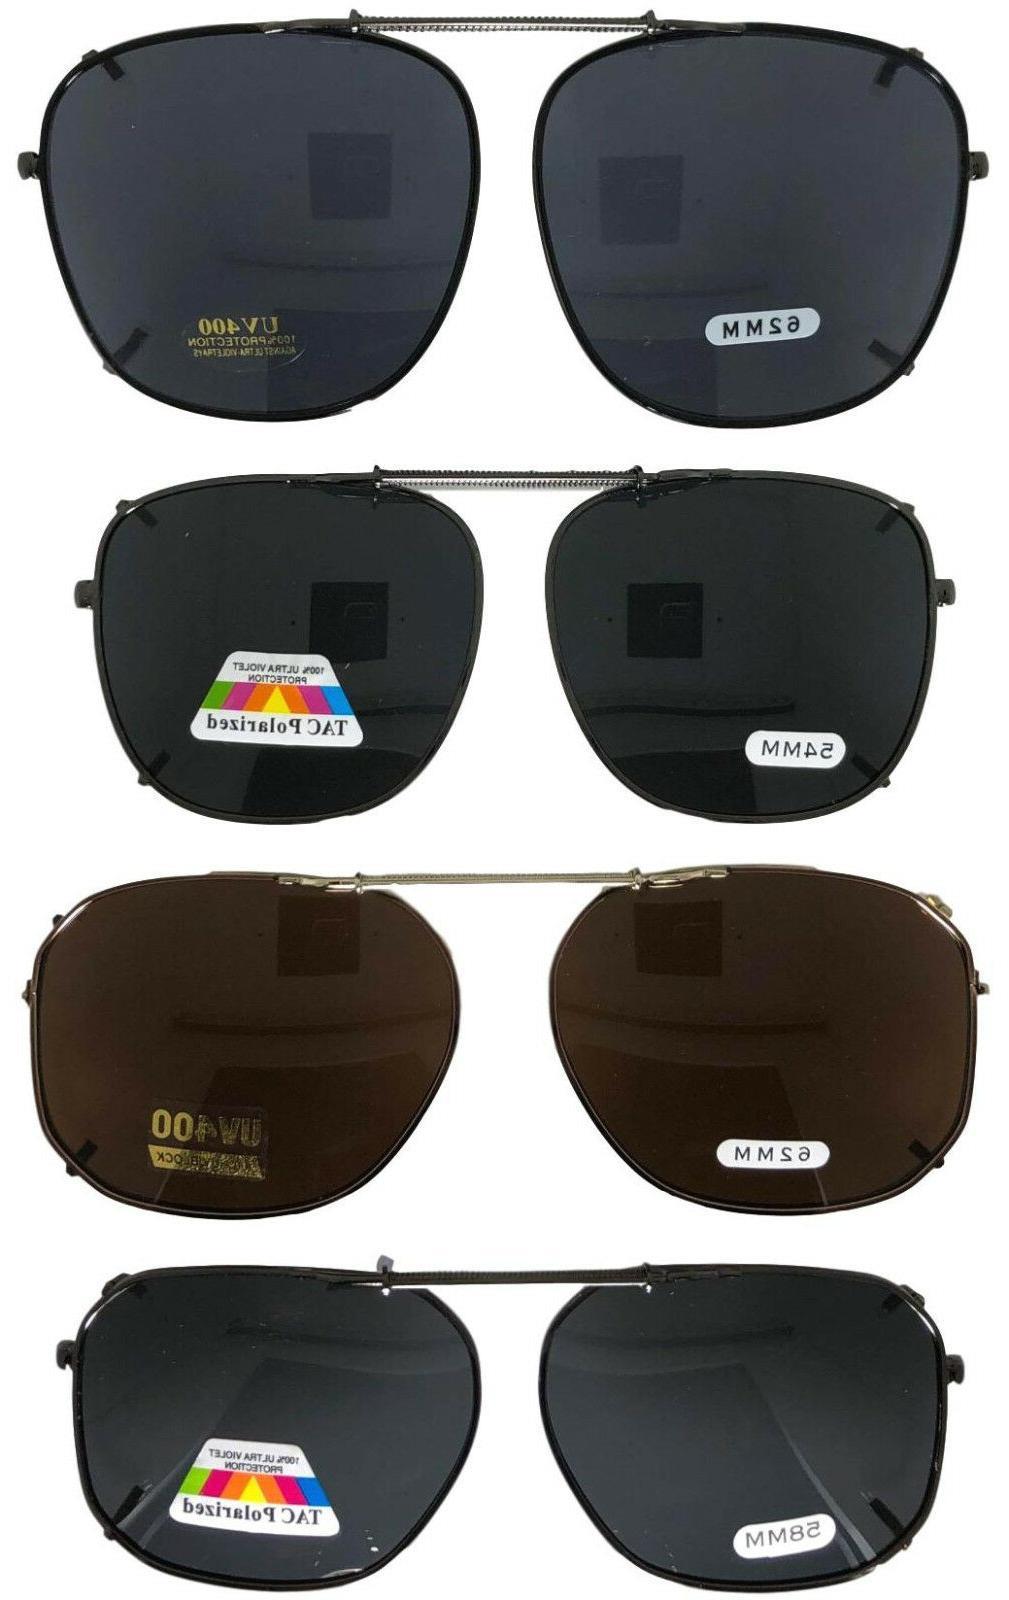 clip on sunglasses for large frame glasses